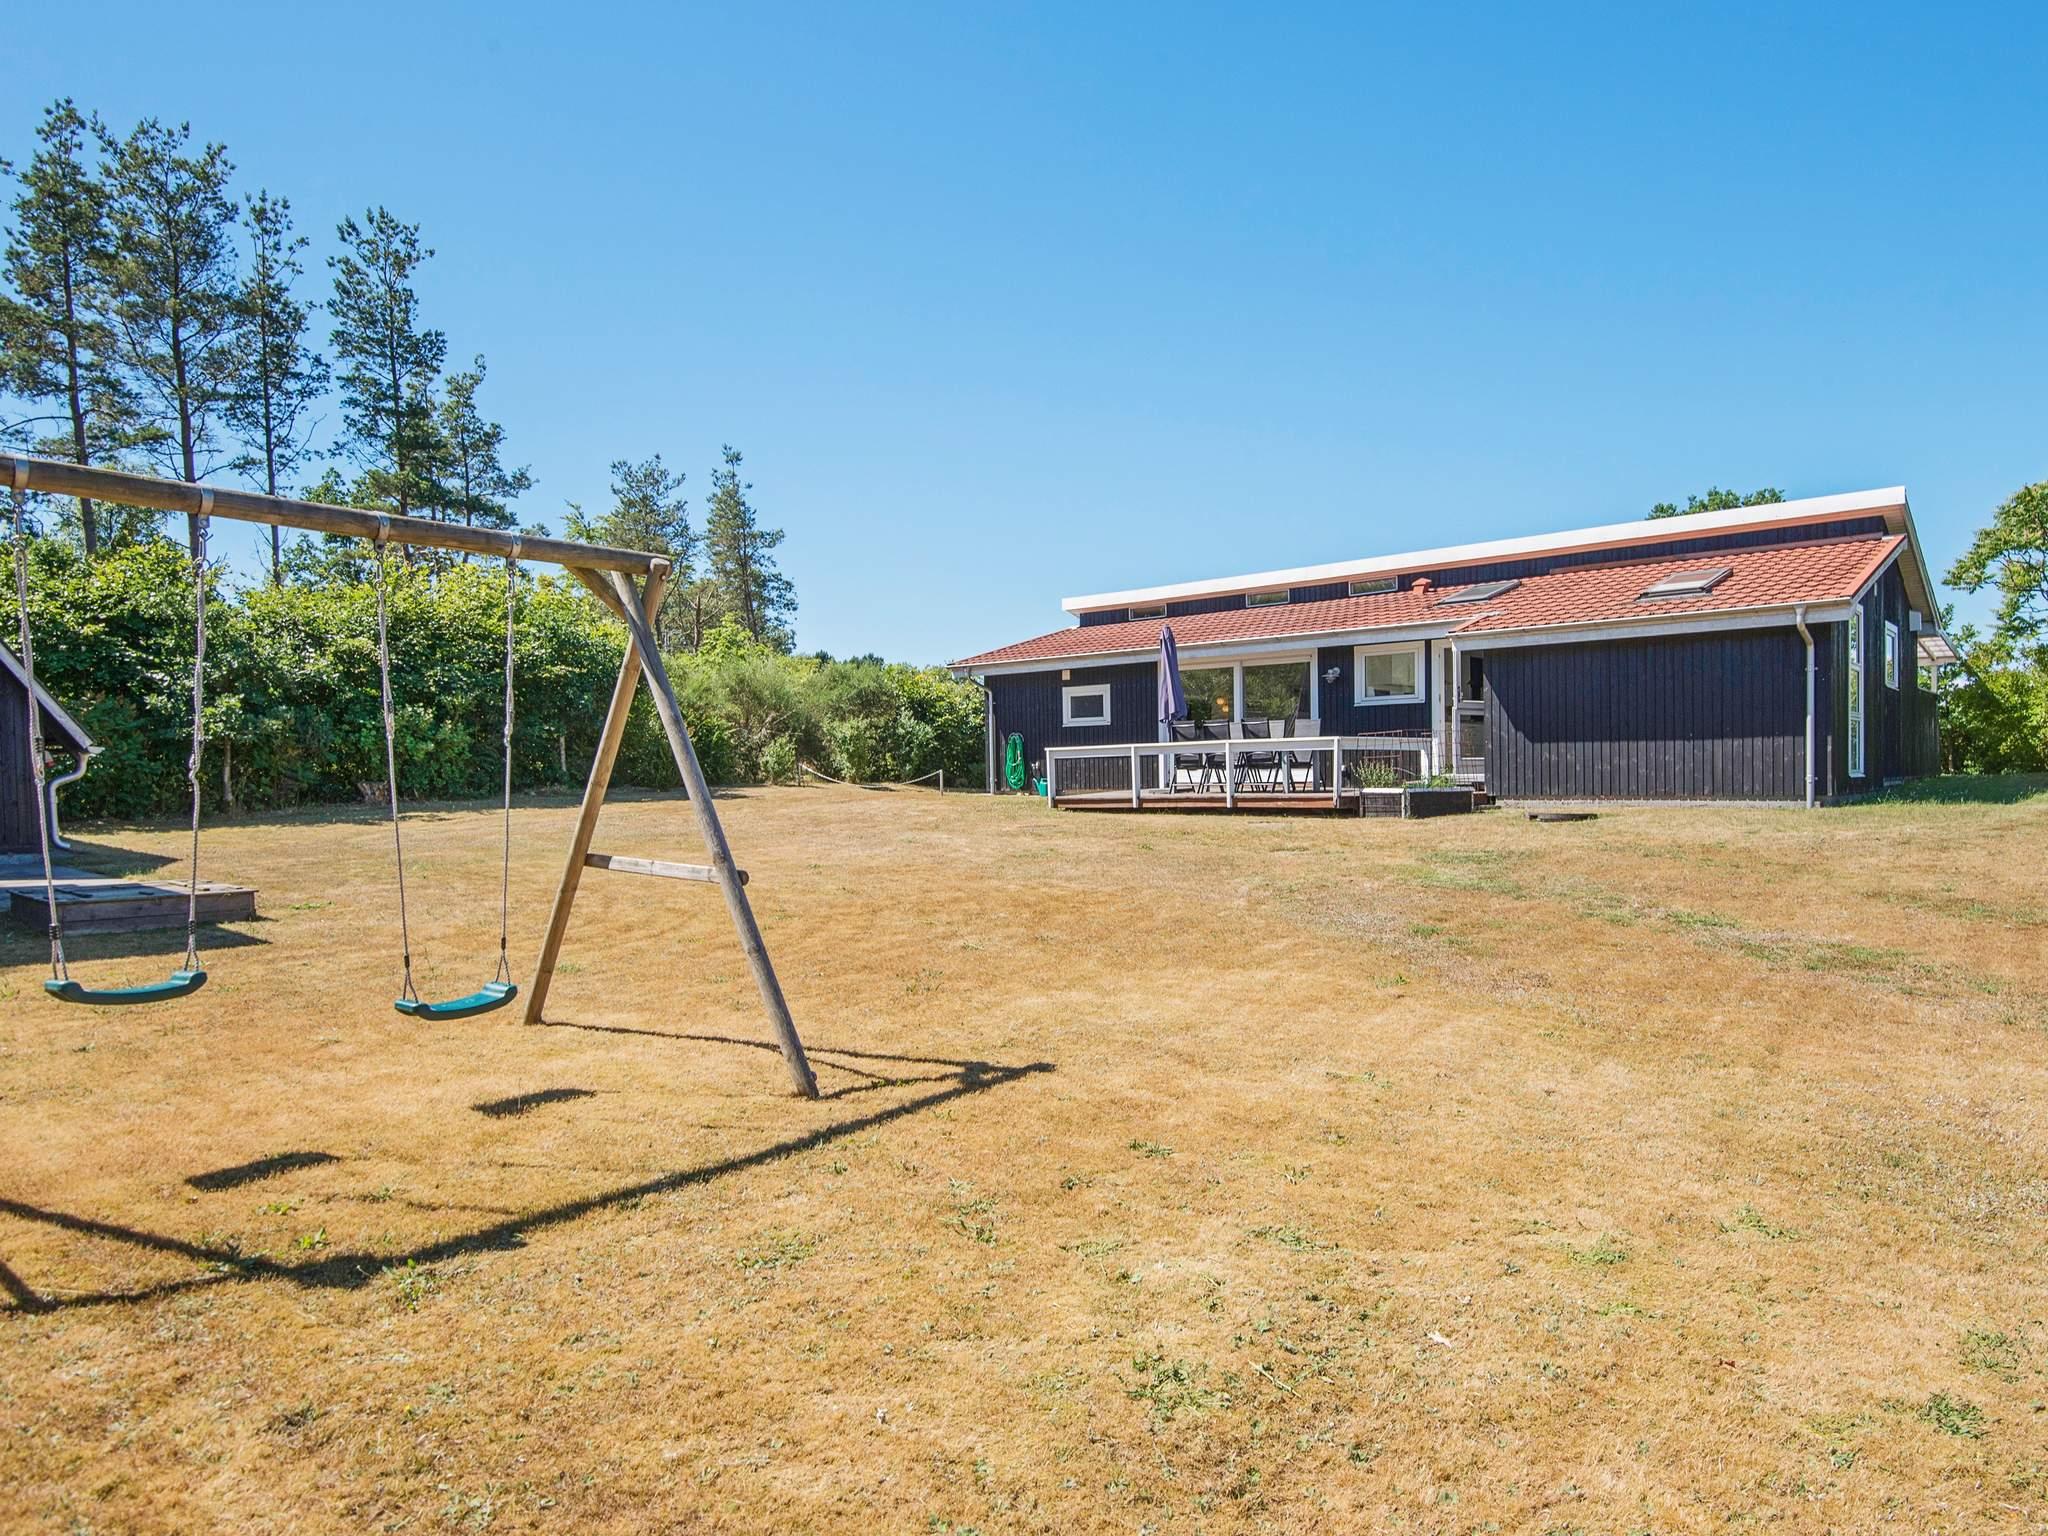 Maison de vacances Helgenæs (978615), Knebel, , Jutland Est, Danemark, image 16